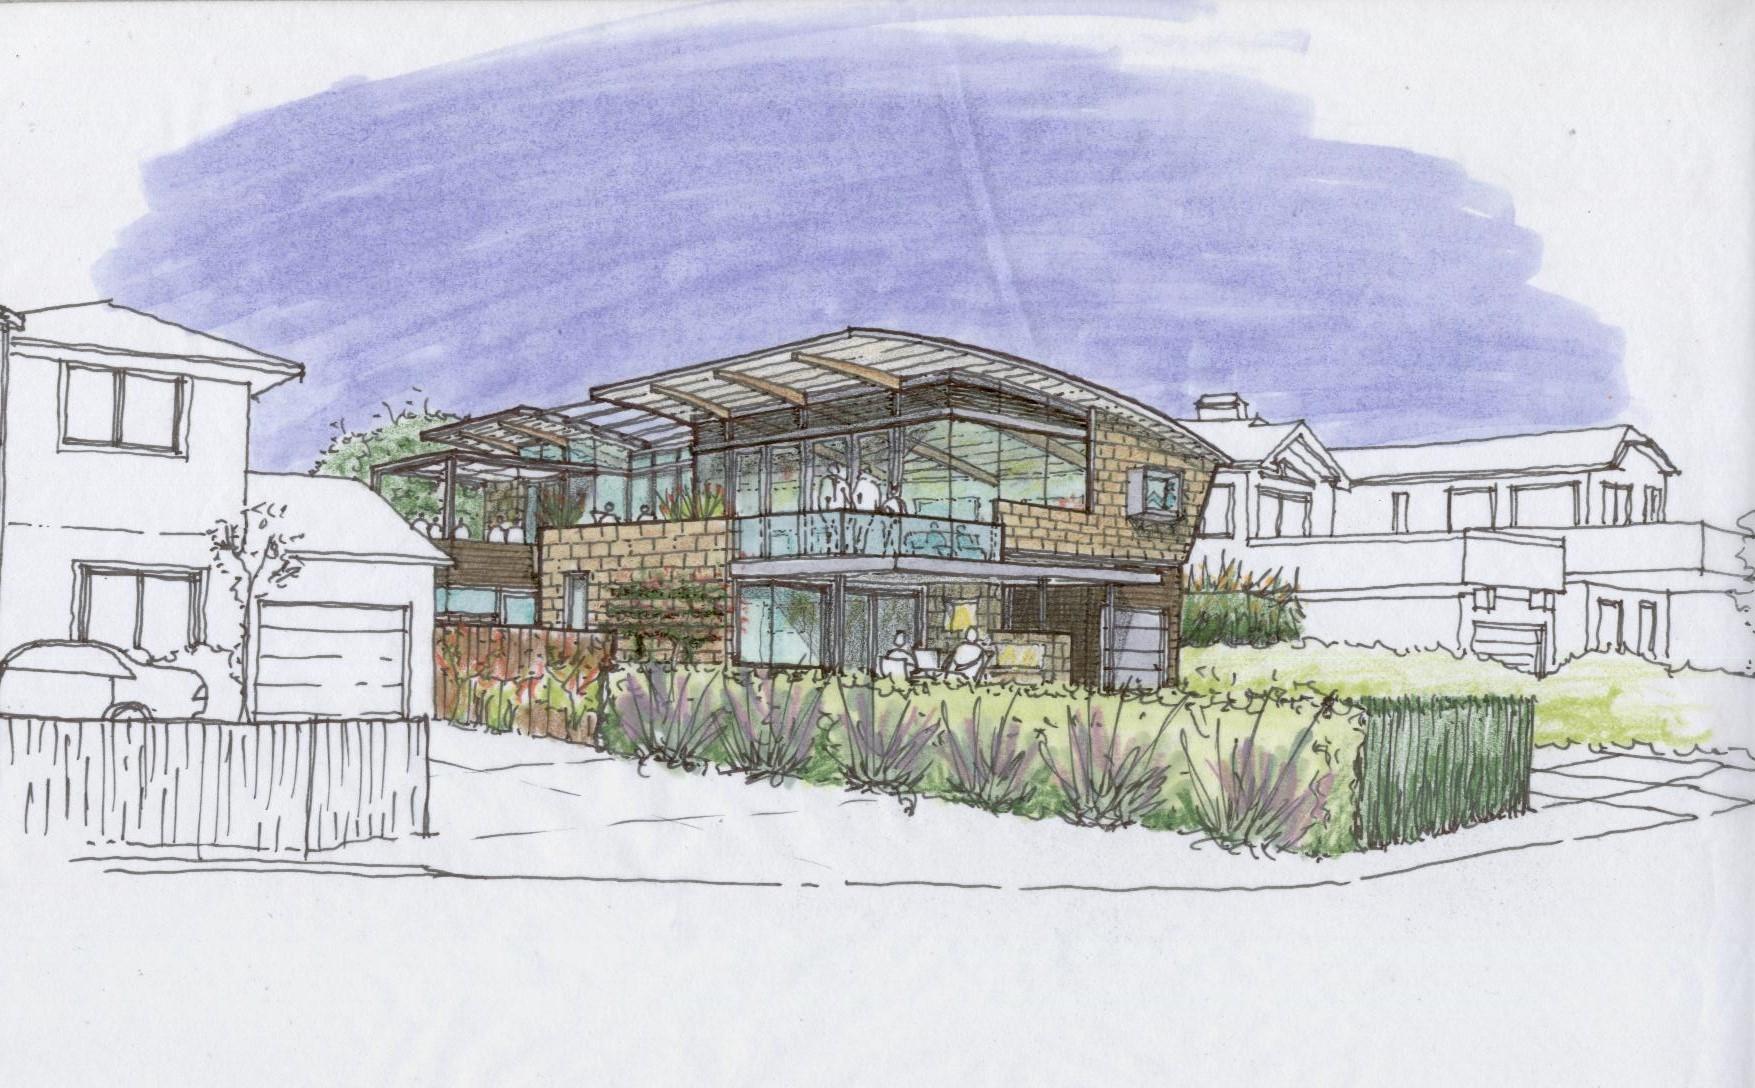 Pleasure Point Residence Sketch - Santa Cruz, CA